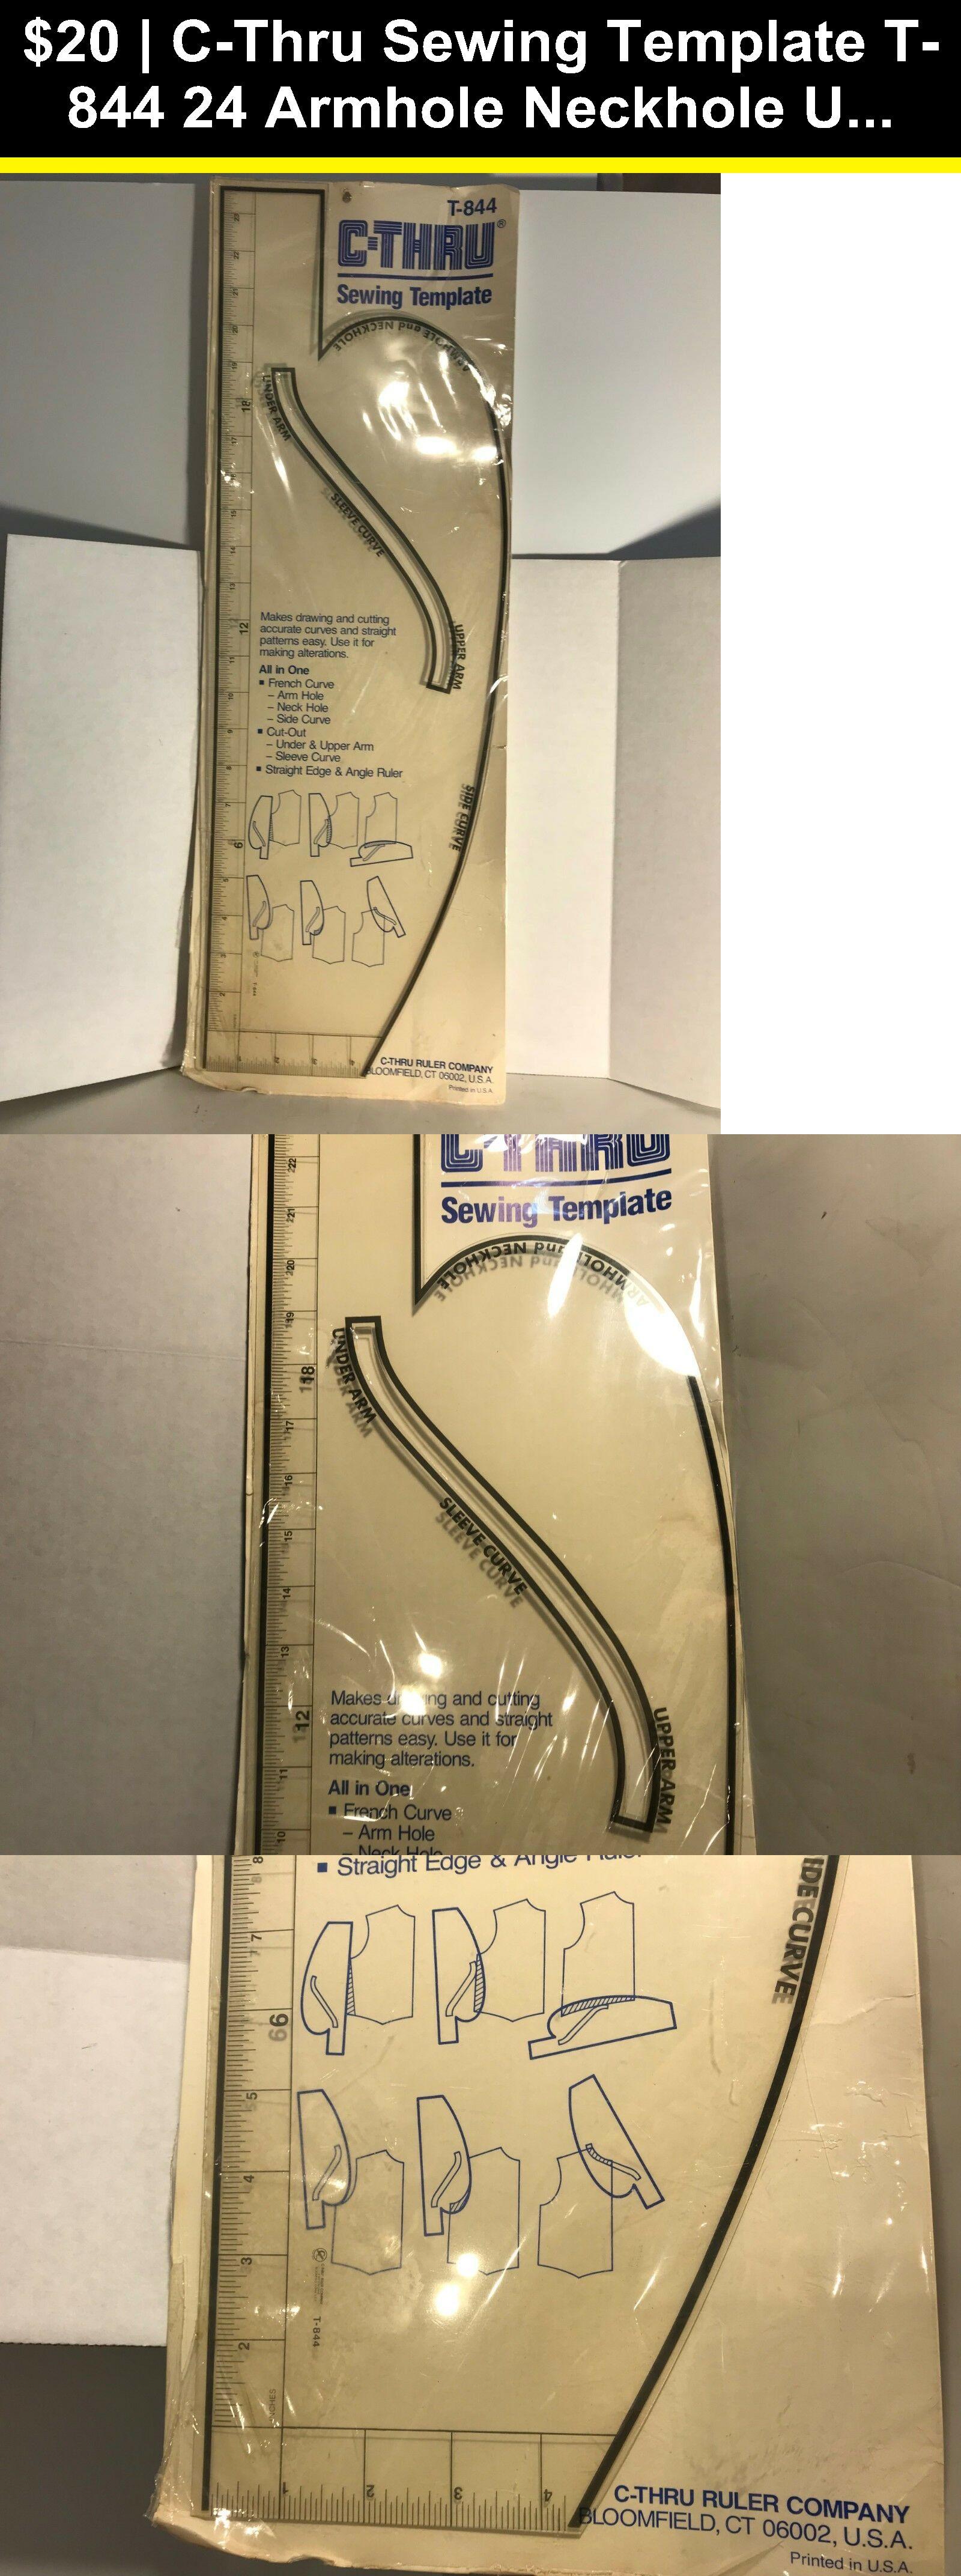 Reusable Face Cover Template Ruler Model DIY Sewing Ruler Handmade Tool Charm